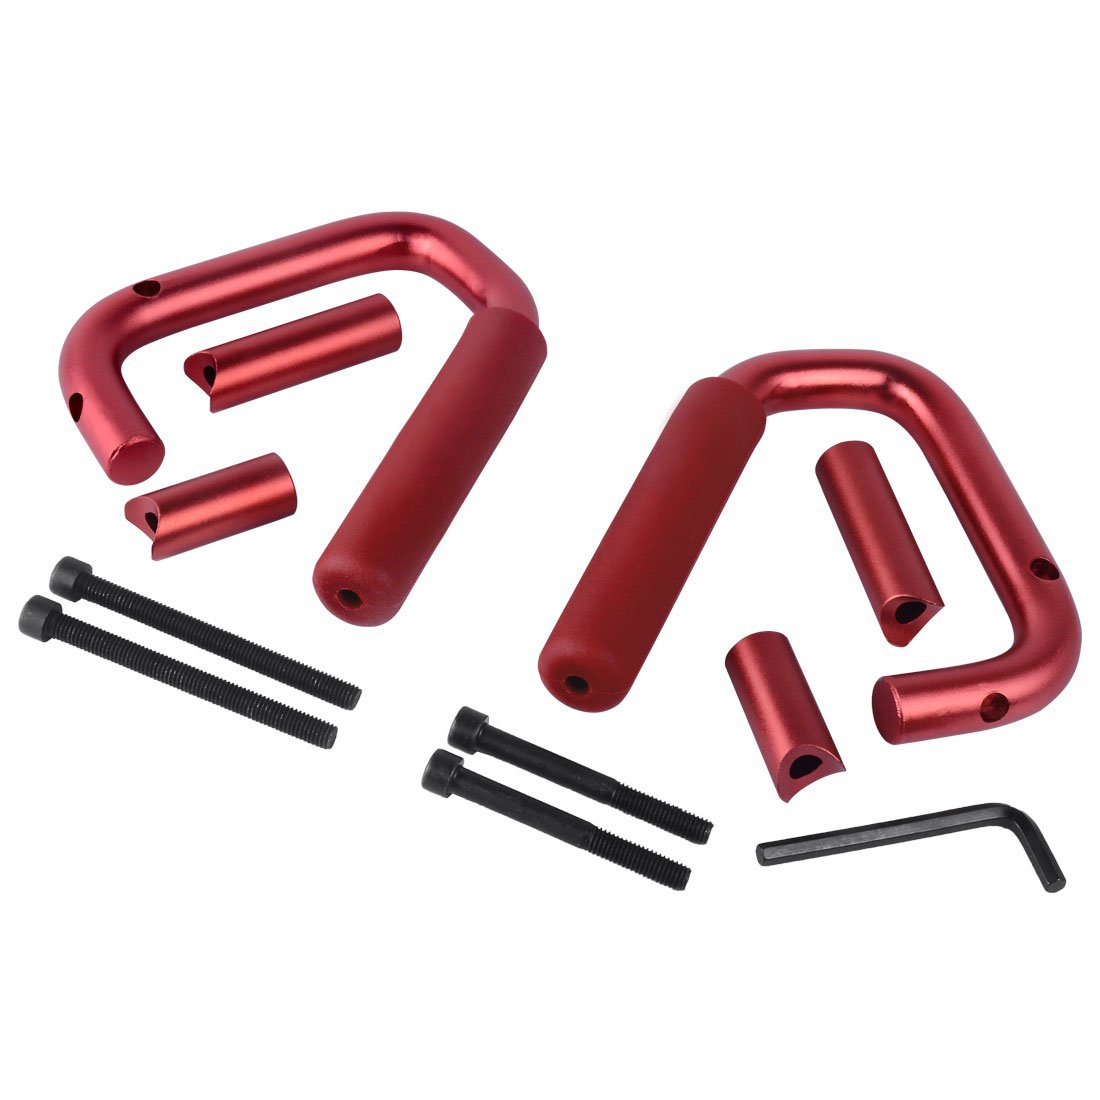 Red AUTOSAVER88 Front /& Rear Grab Handles Roll Bar Steel Grip Handles Compatible for Jeep Wrangler JK JKU Unlimited Sports Bubicon Sahara 2007-2018 4 Doors